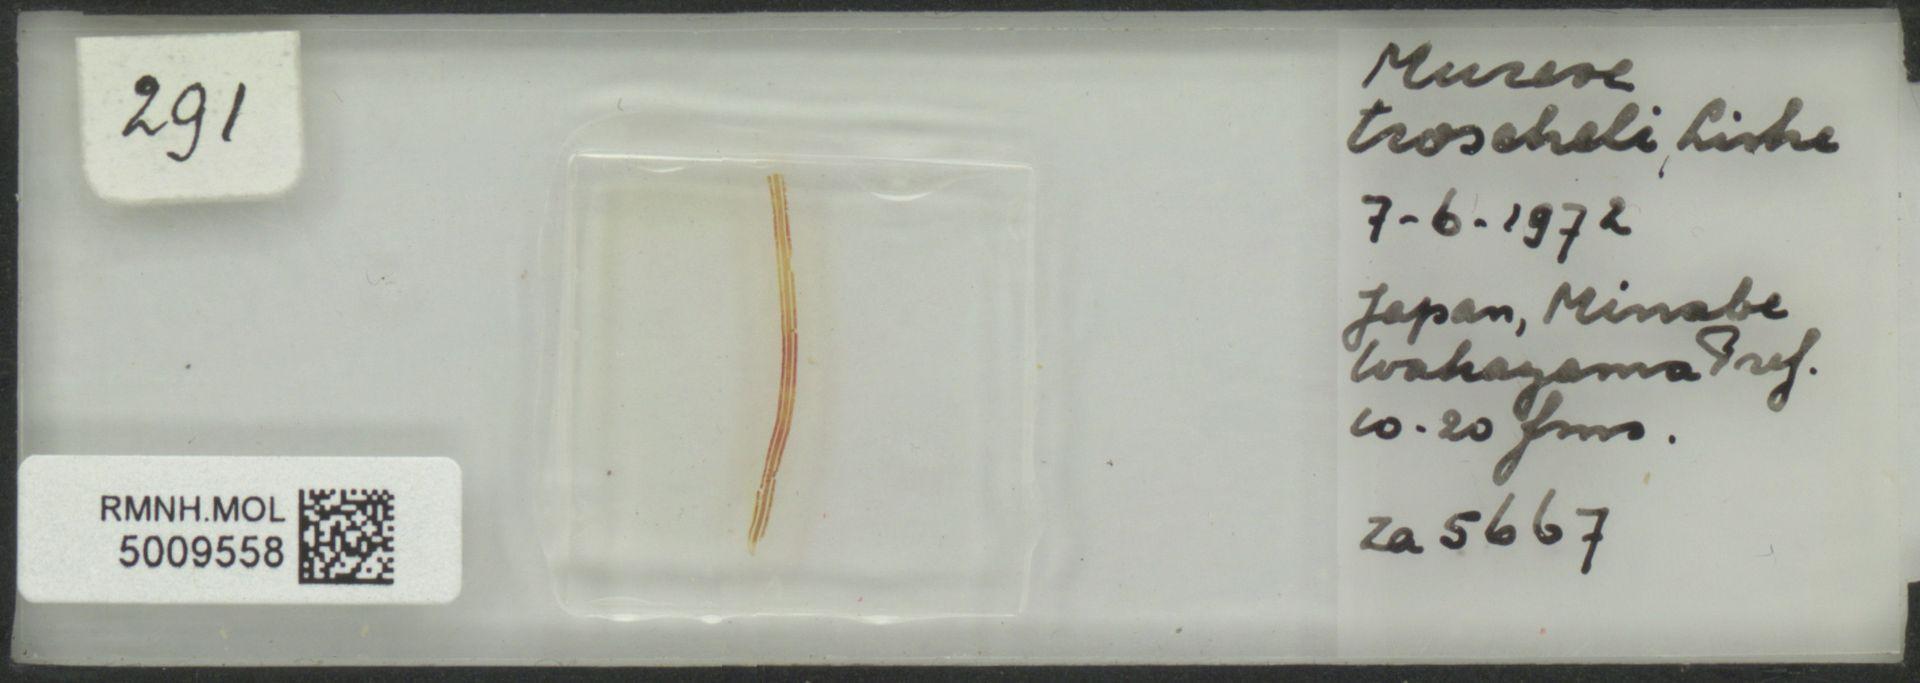 RMNH.MOL.5009558   Murex troscheli Lischke, 1868